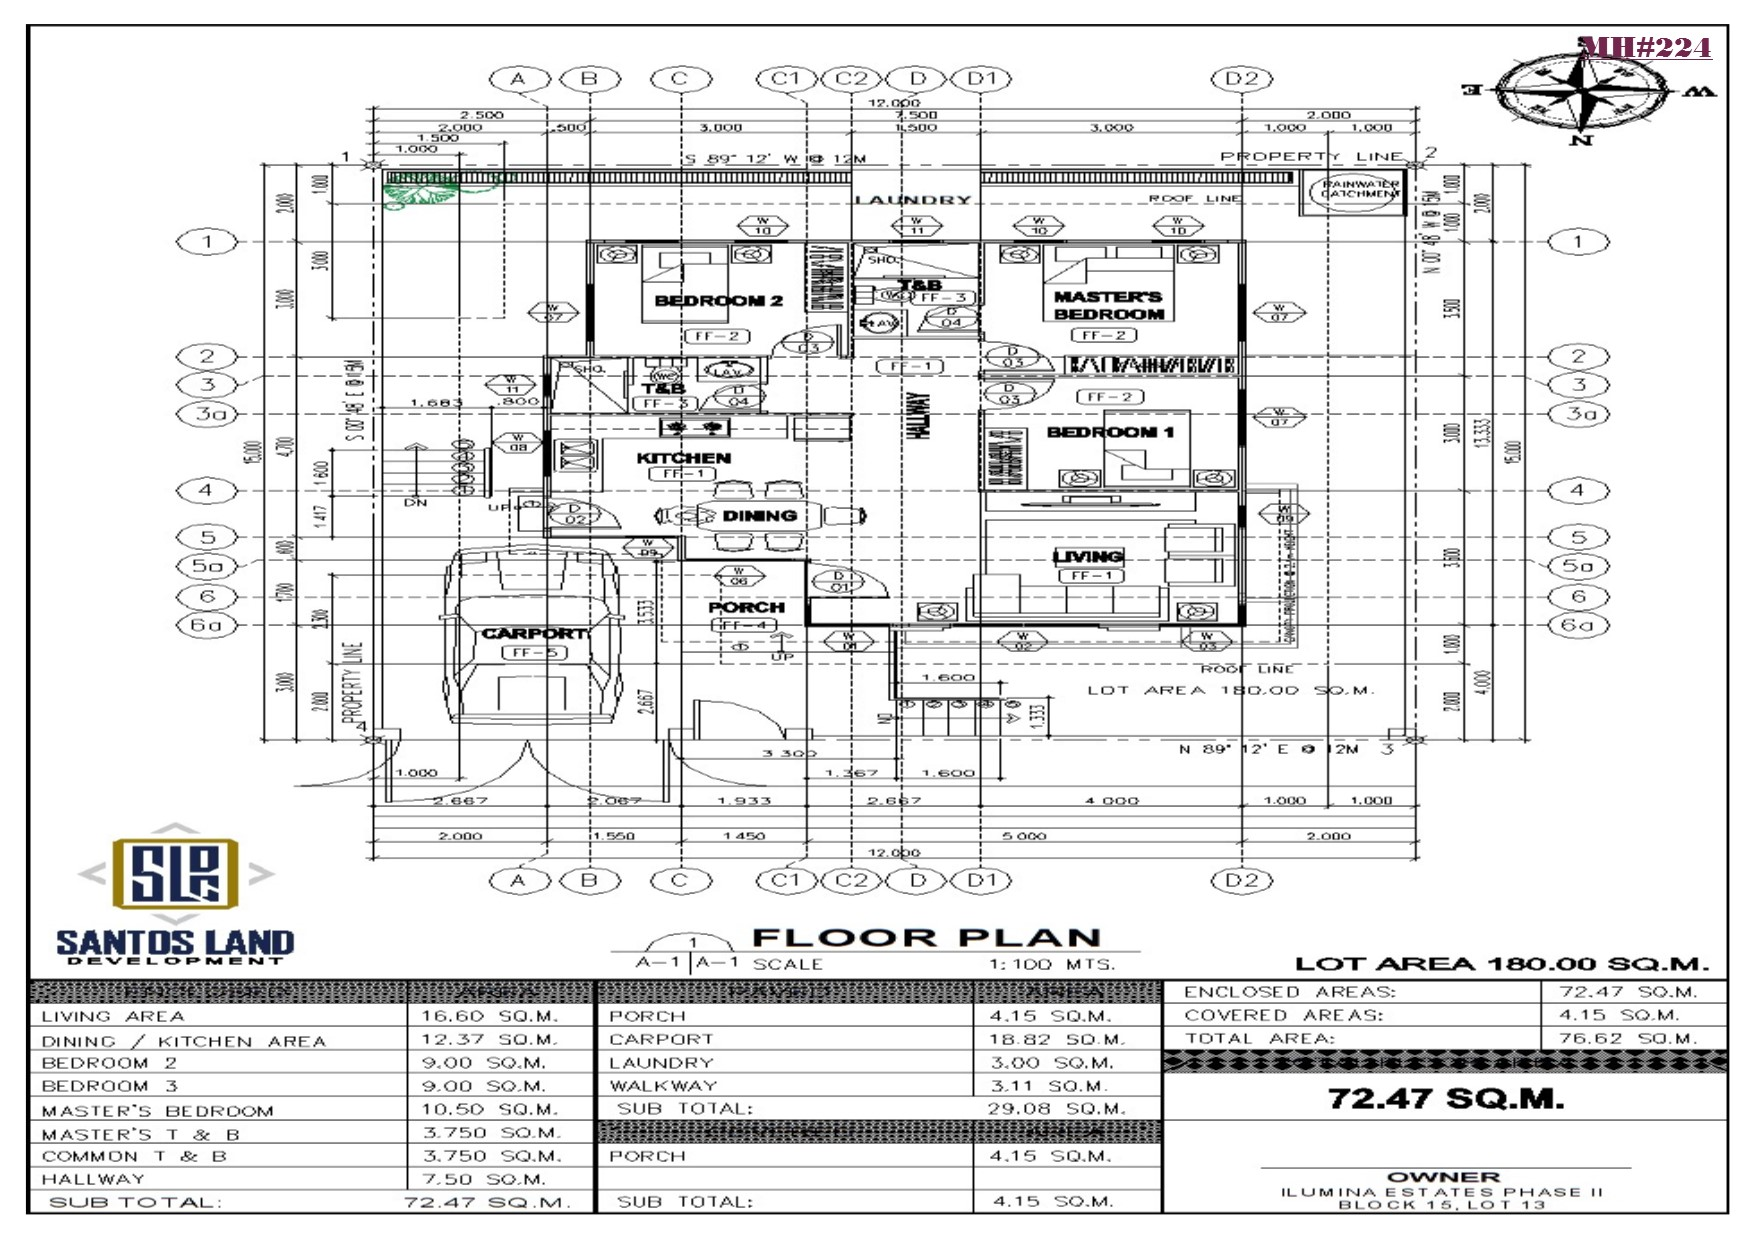 ilumina-estates-davao-model-house-224-floor-plan